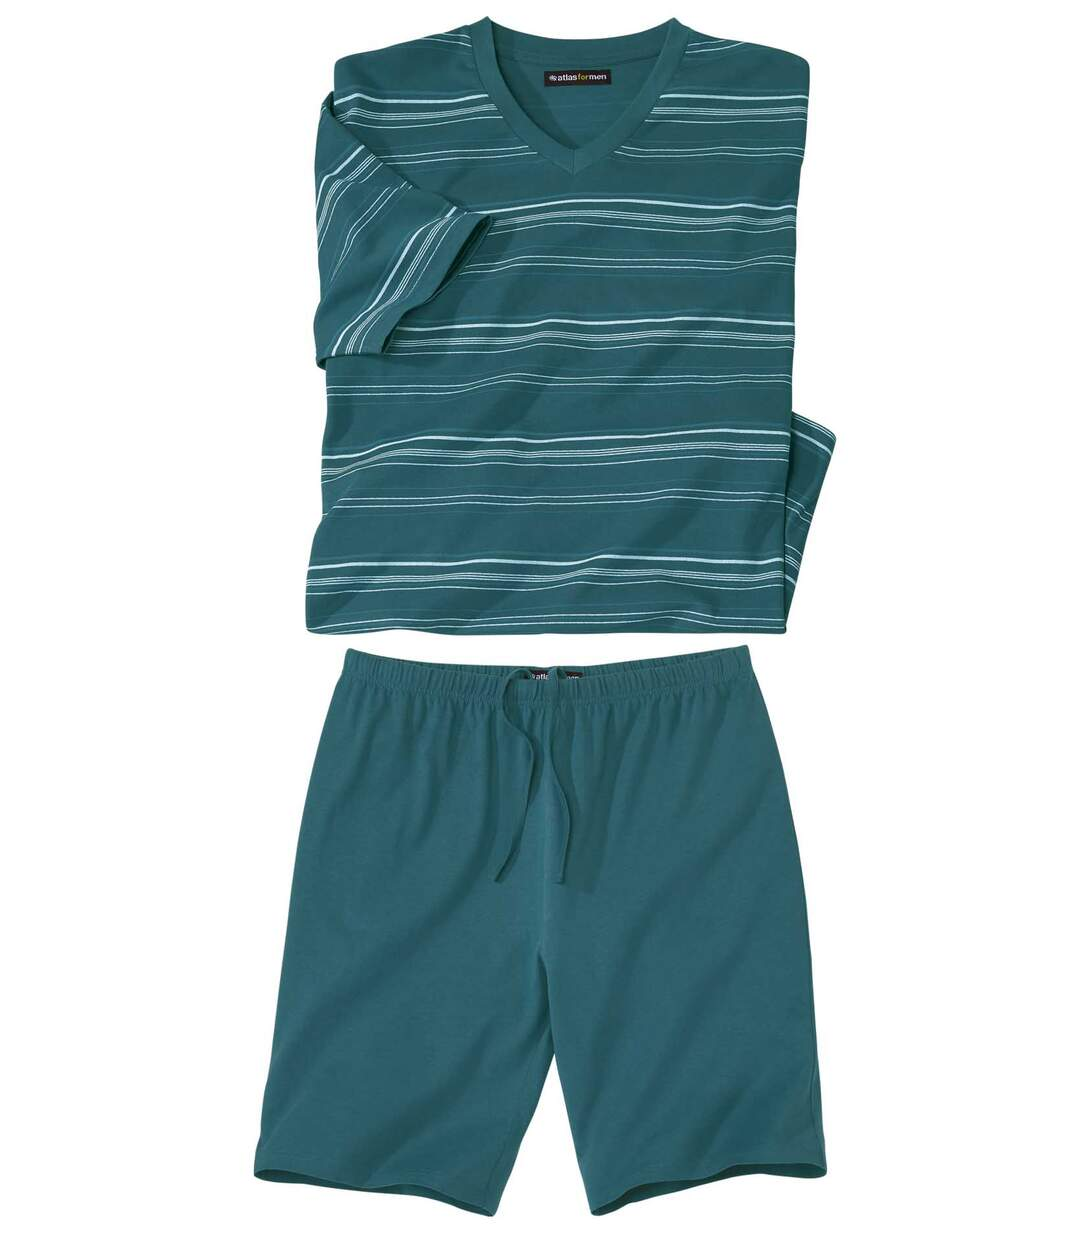 Men's Blue Striped Pyjama Short Set Atlas For Men